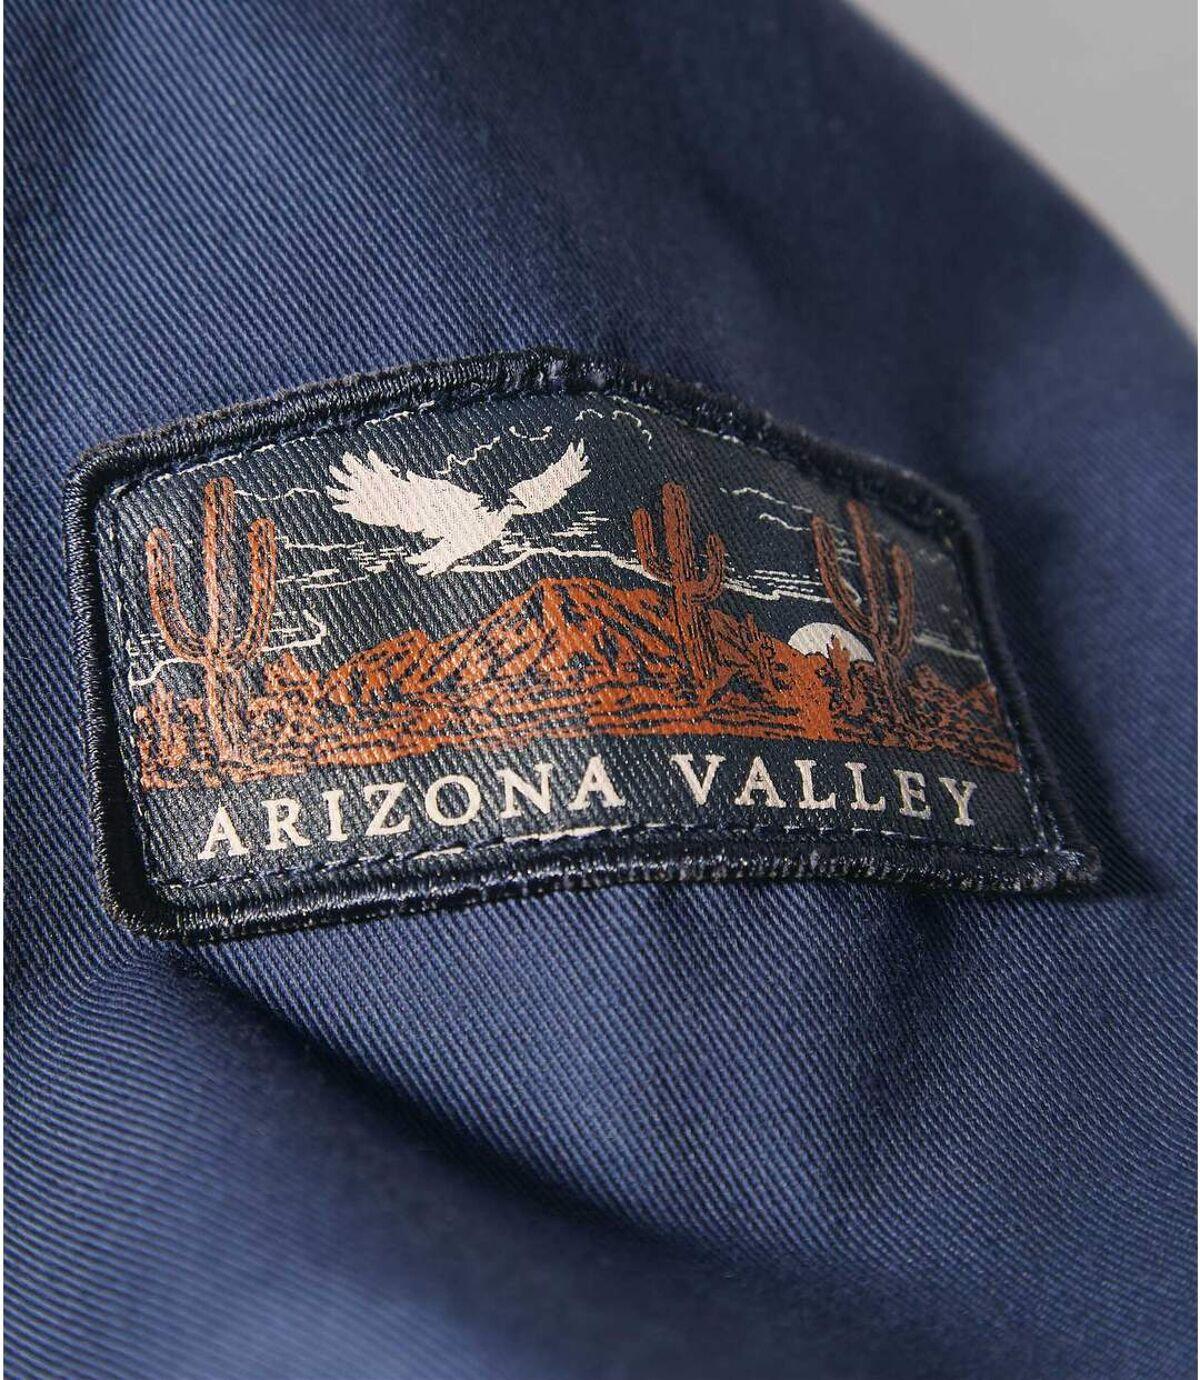 Kurtka saharyjska Arizona Valley Atlas For Men